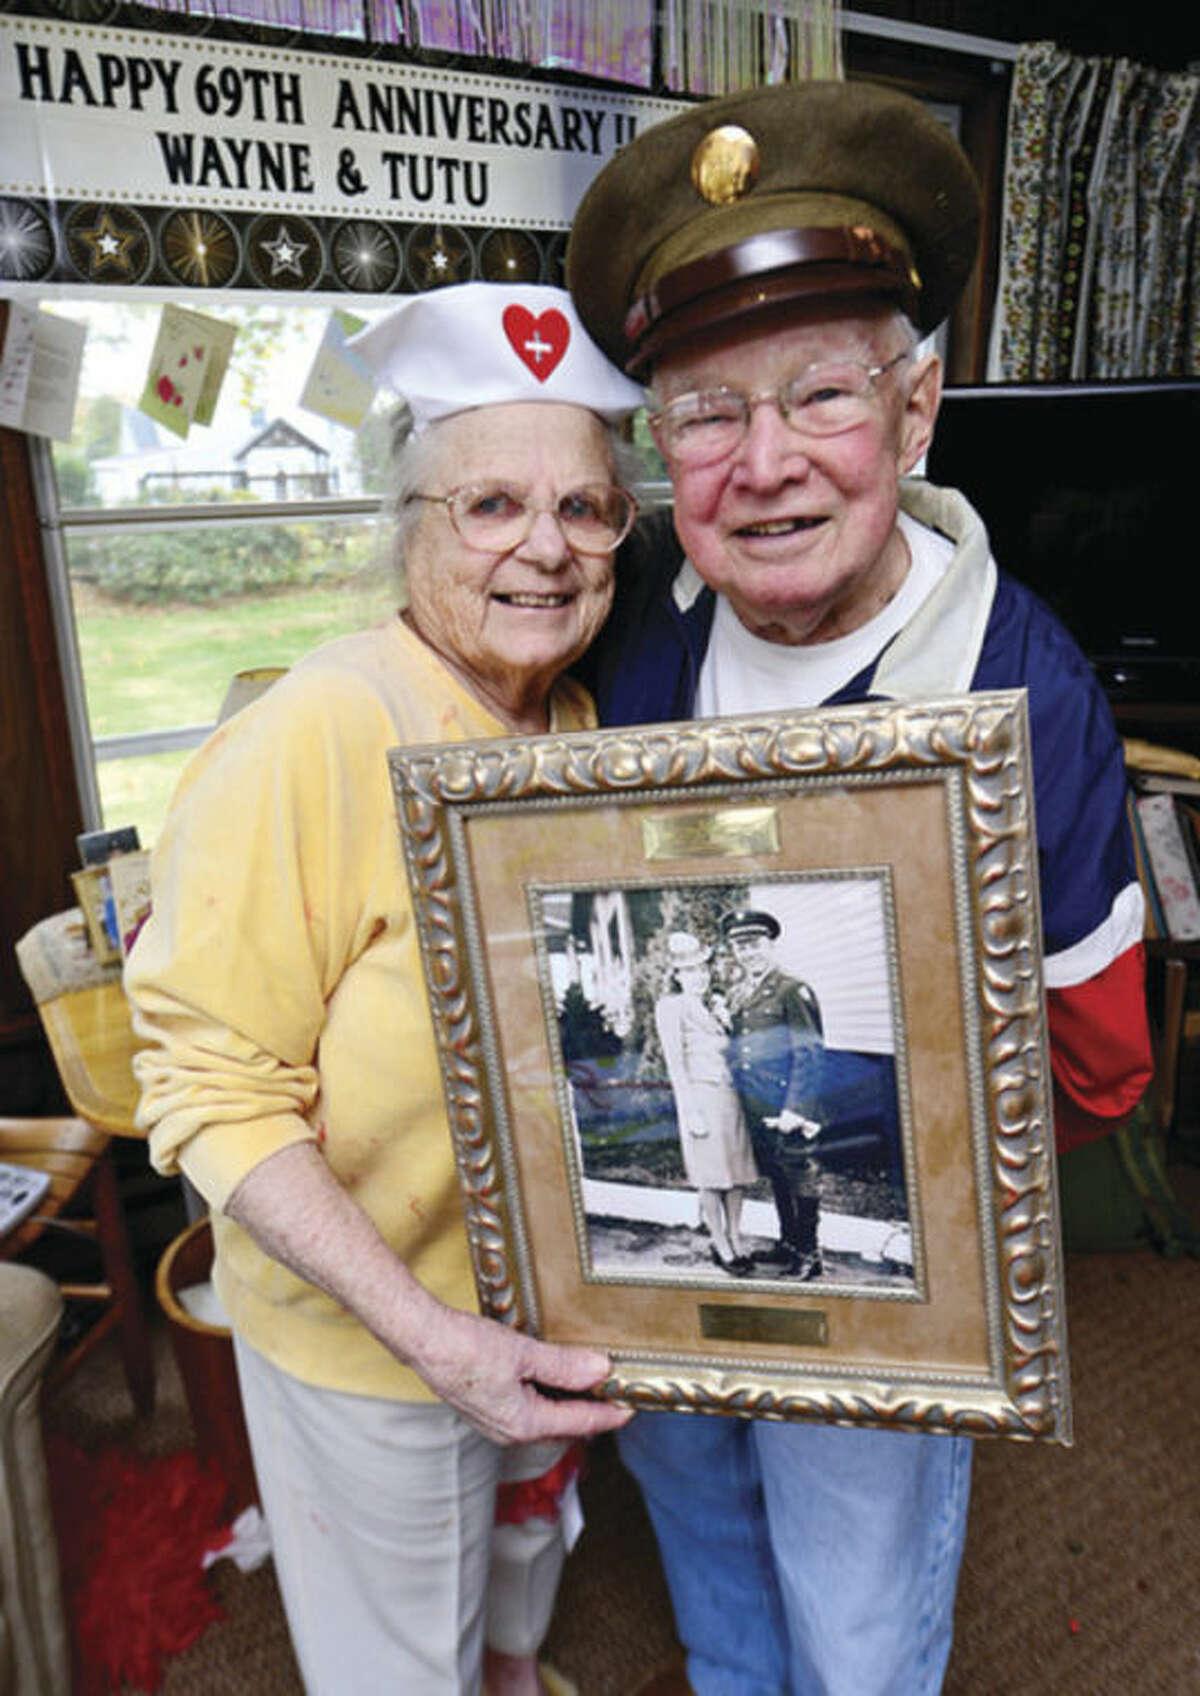 Hour photo / Erik Trautmann Mary and Wayne Shadbolt celebrate their 69th wedding anniversary on Halloween Thursday.